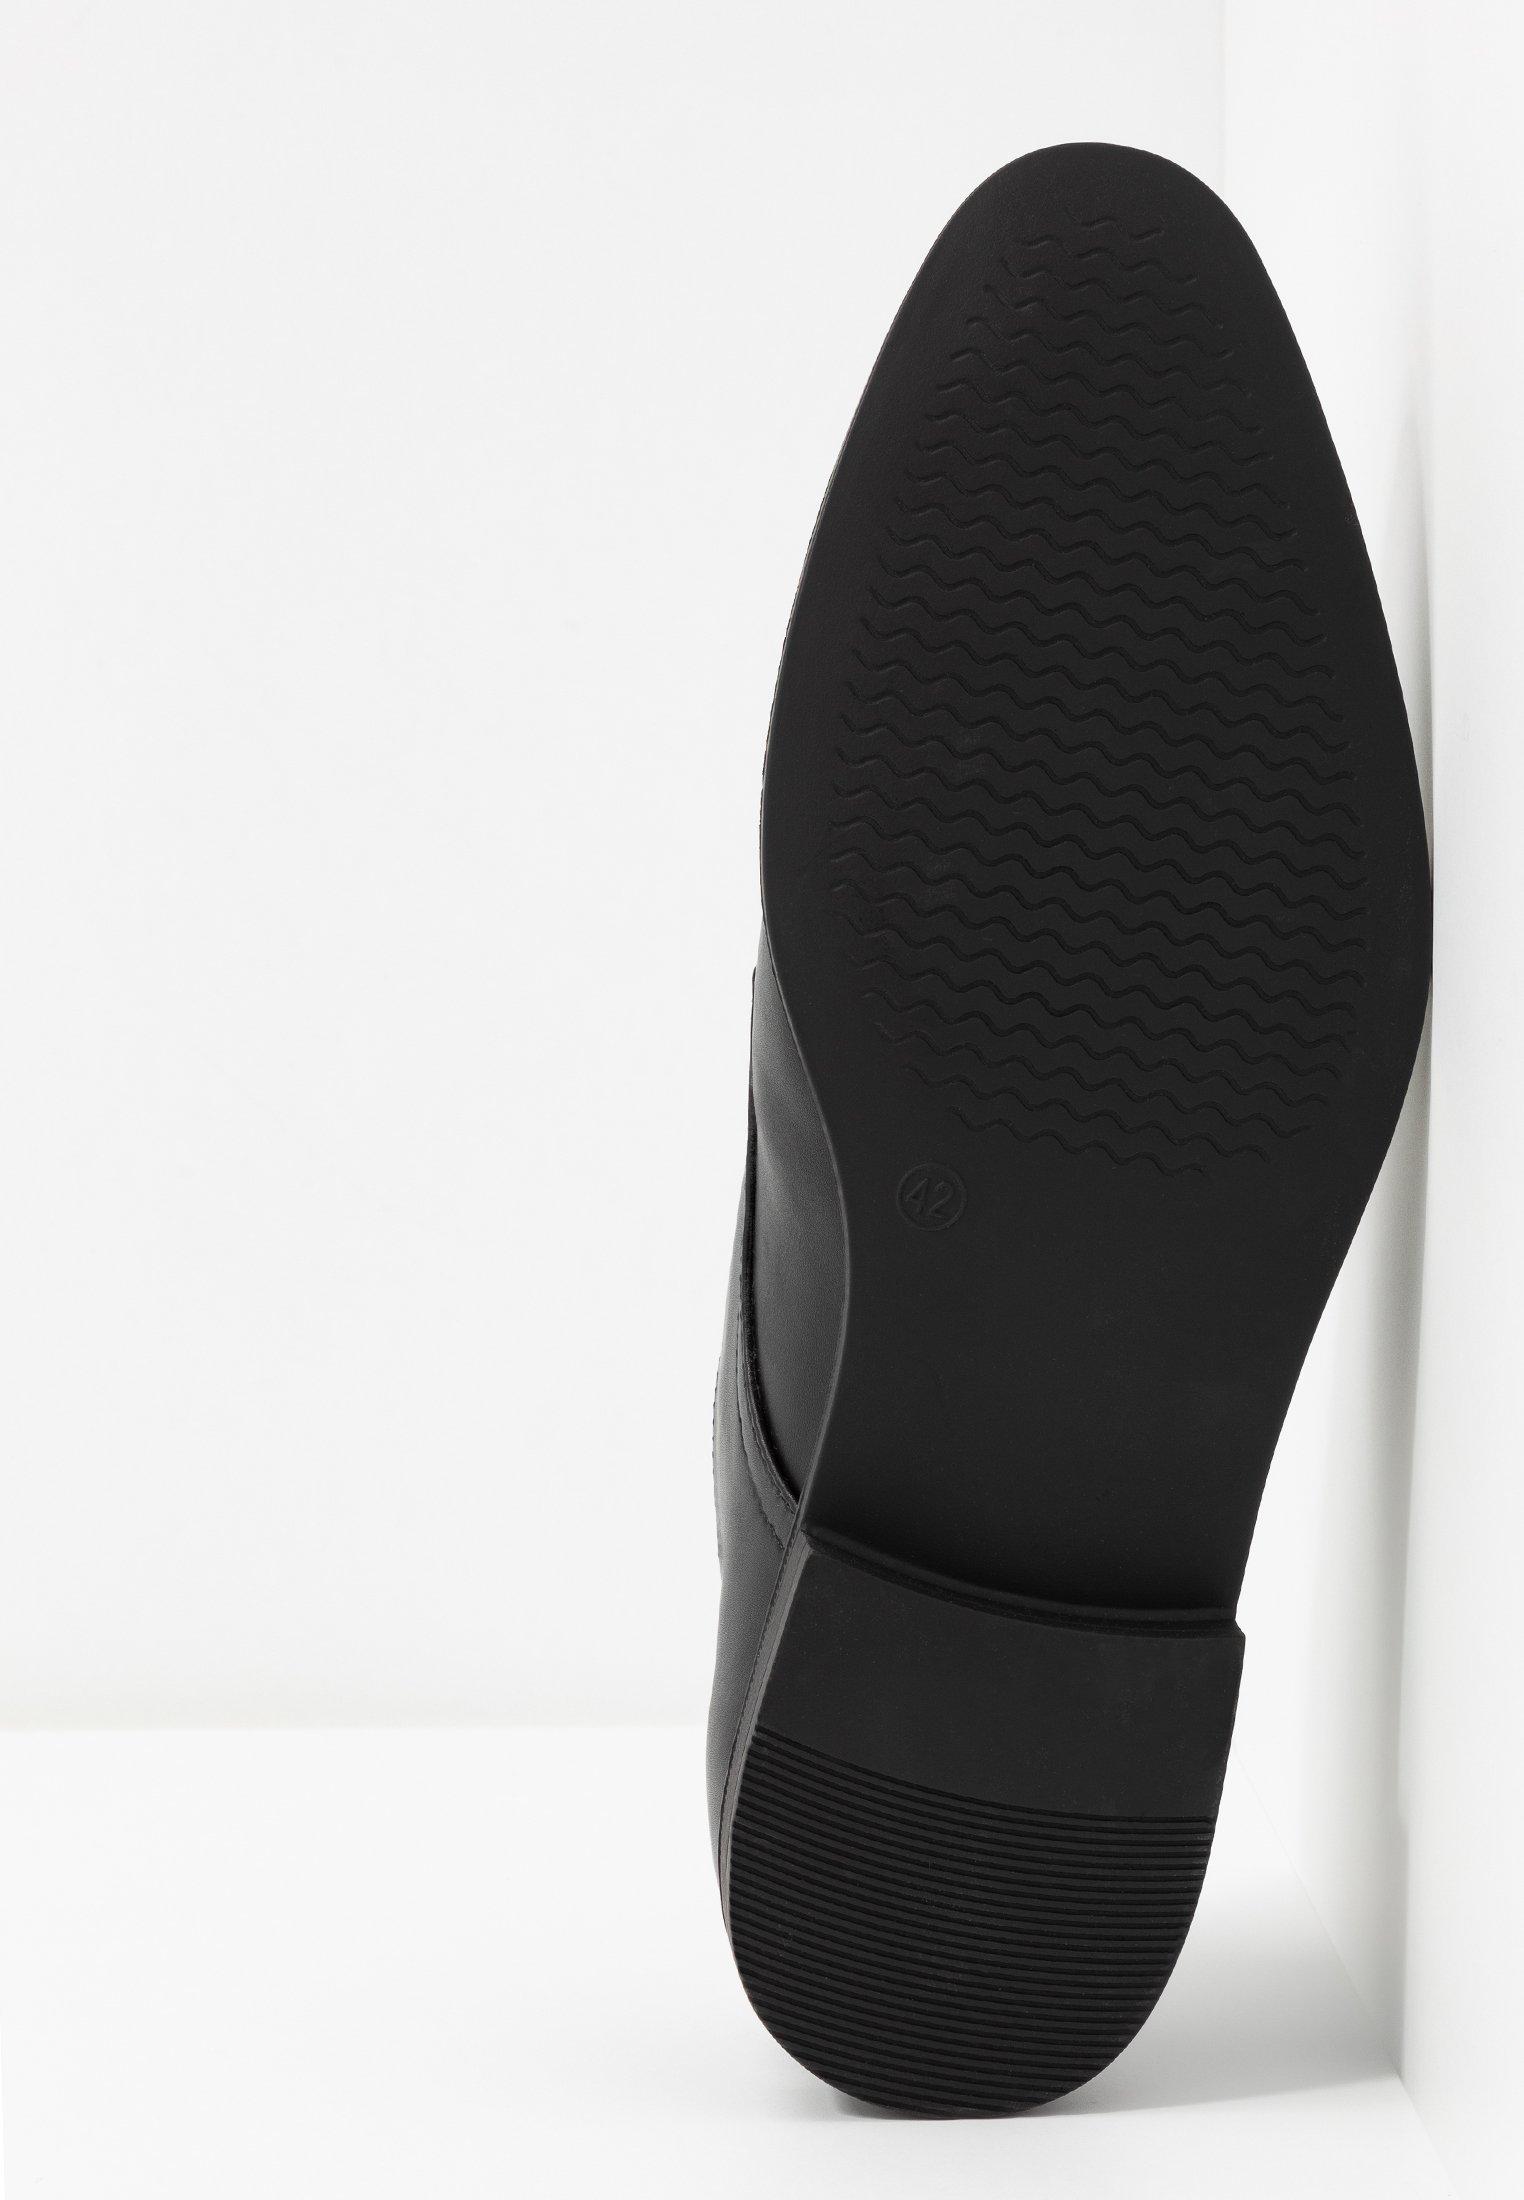 Pier One Slip-ins - black/svart - Herrskor xV3yS